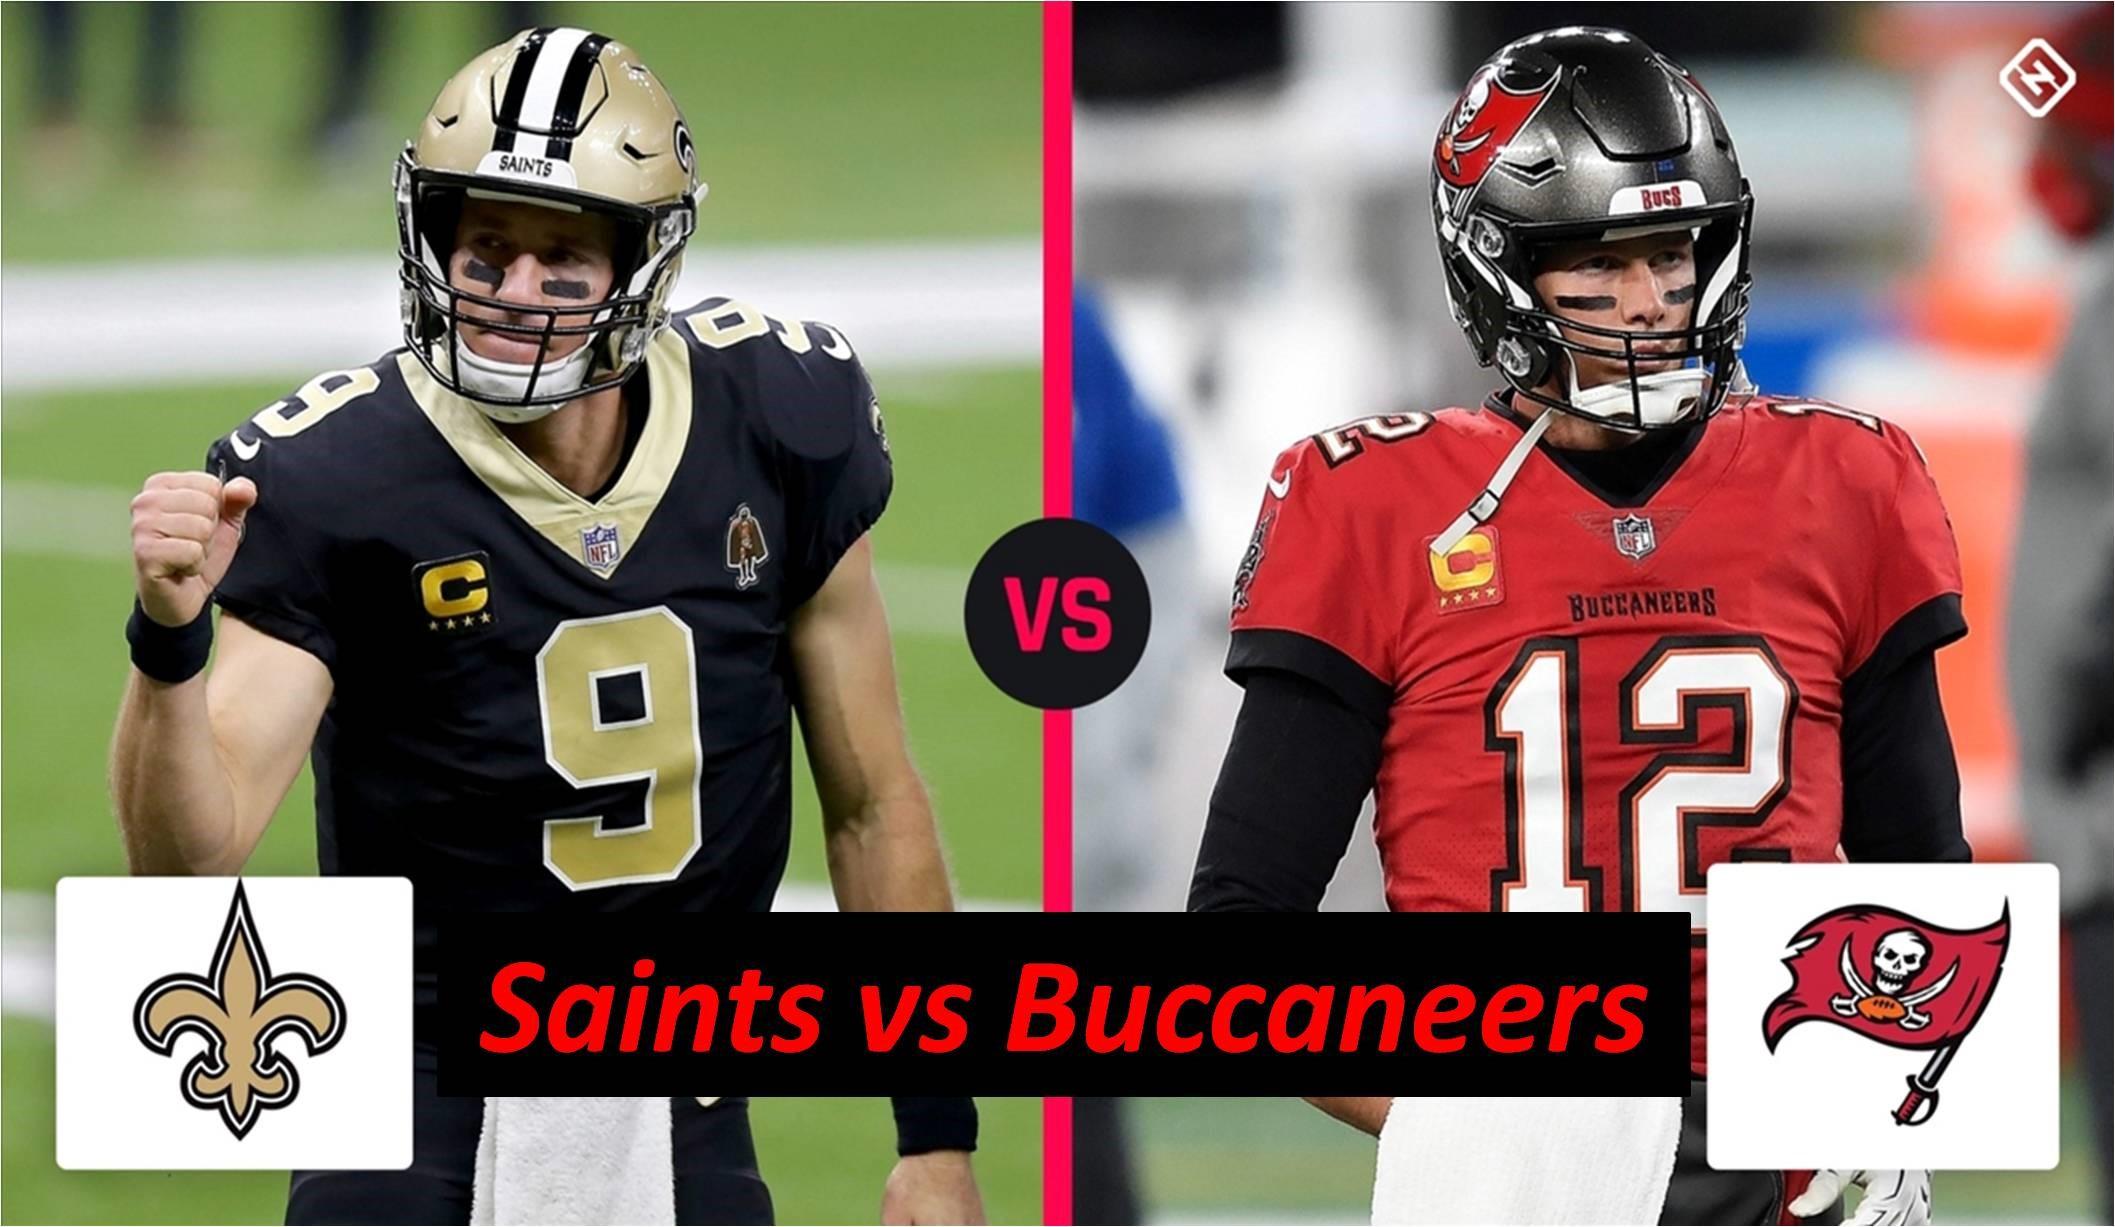 NFL Week 9 । New Orleans Saints vs Tampa Bay Buccaneers: Live Stream  American Football । Predictions, US Start time, history - Programming  Insider